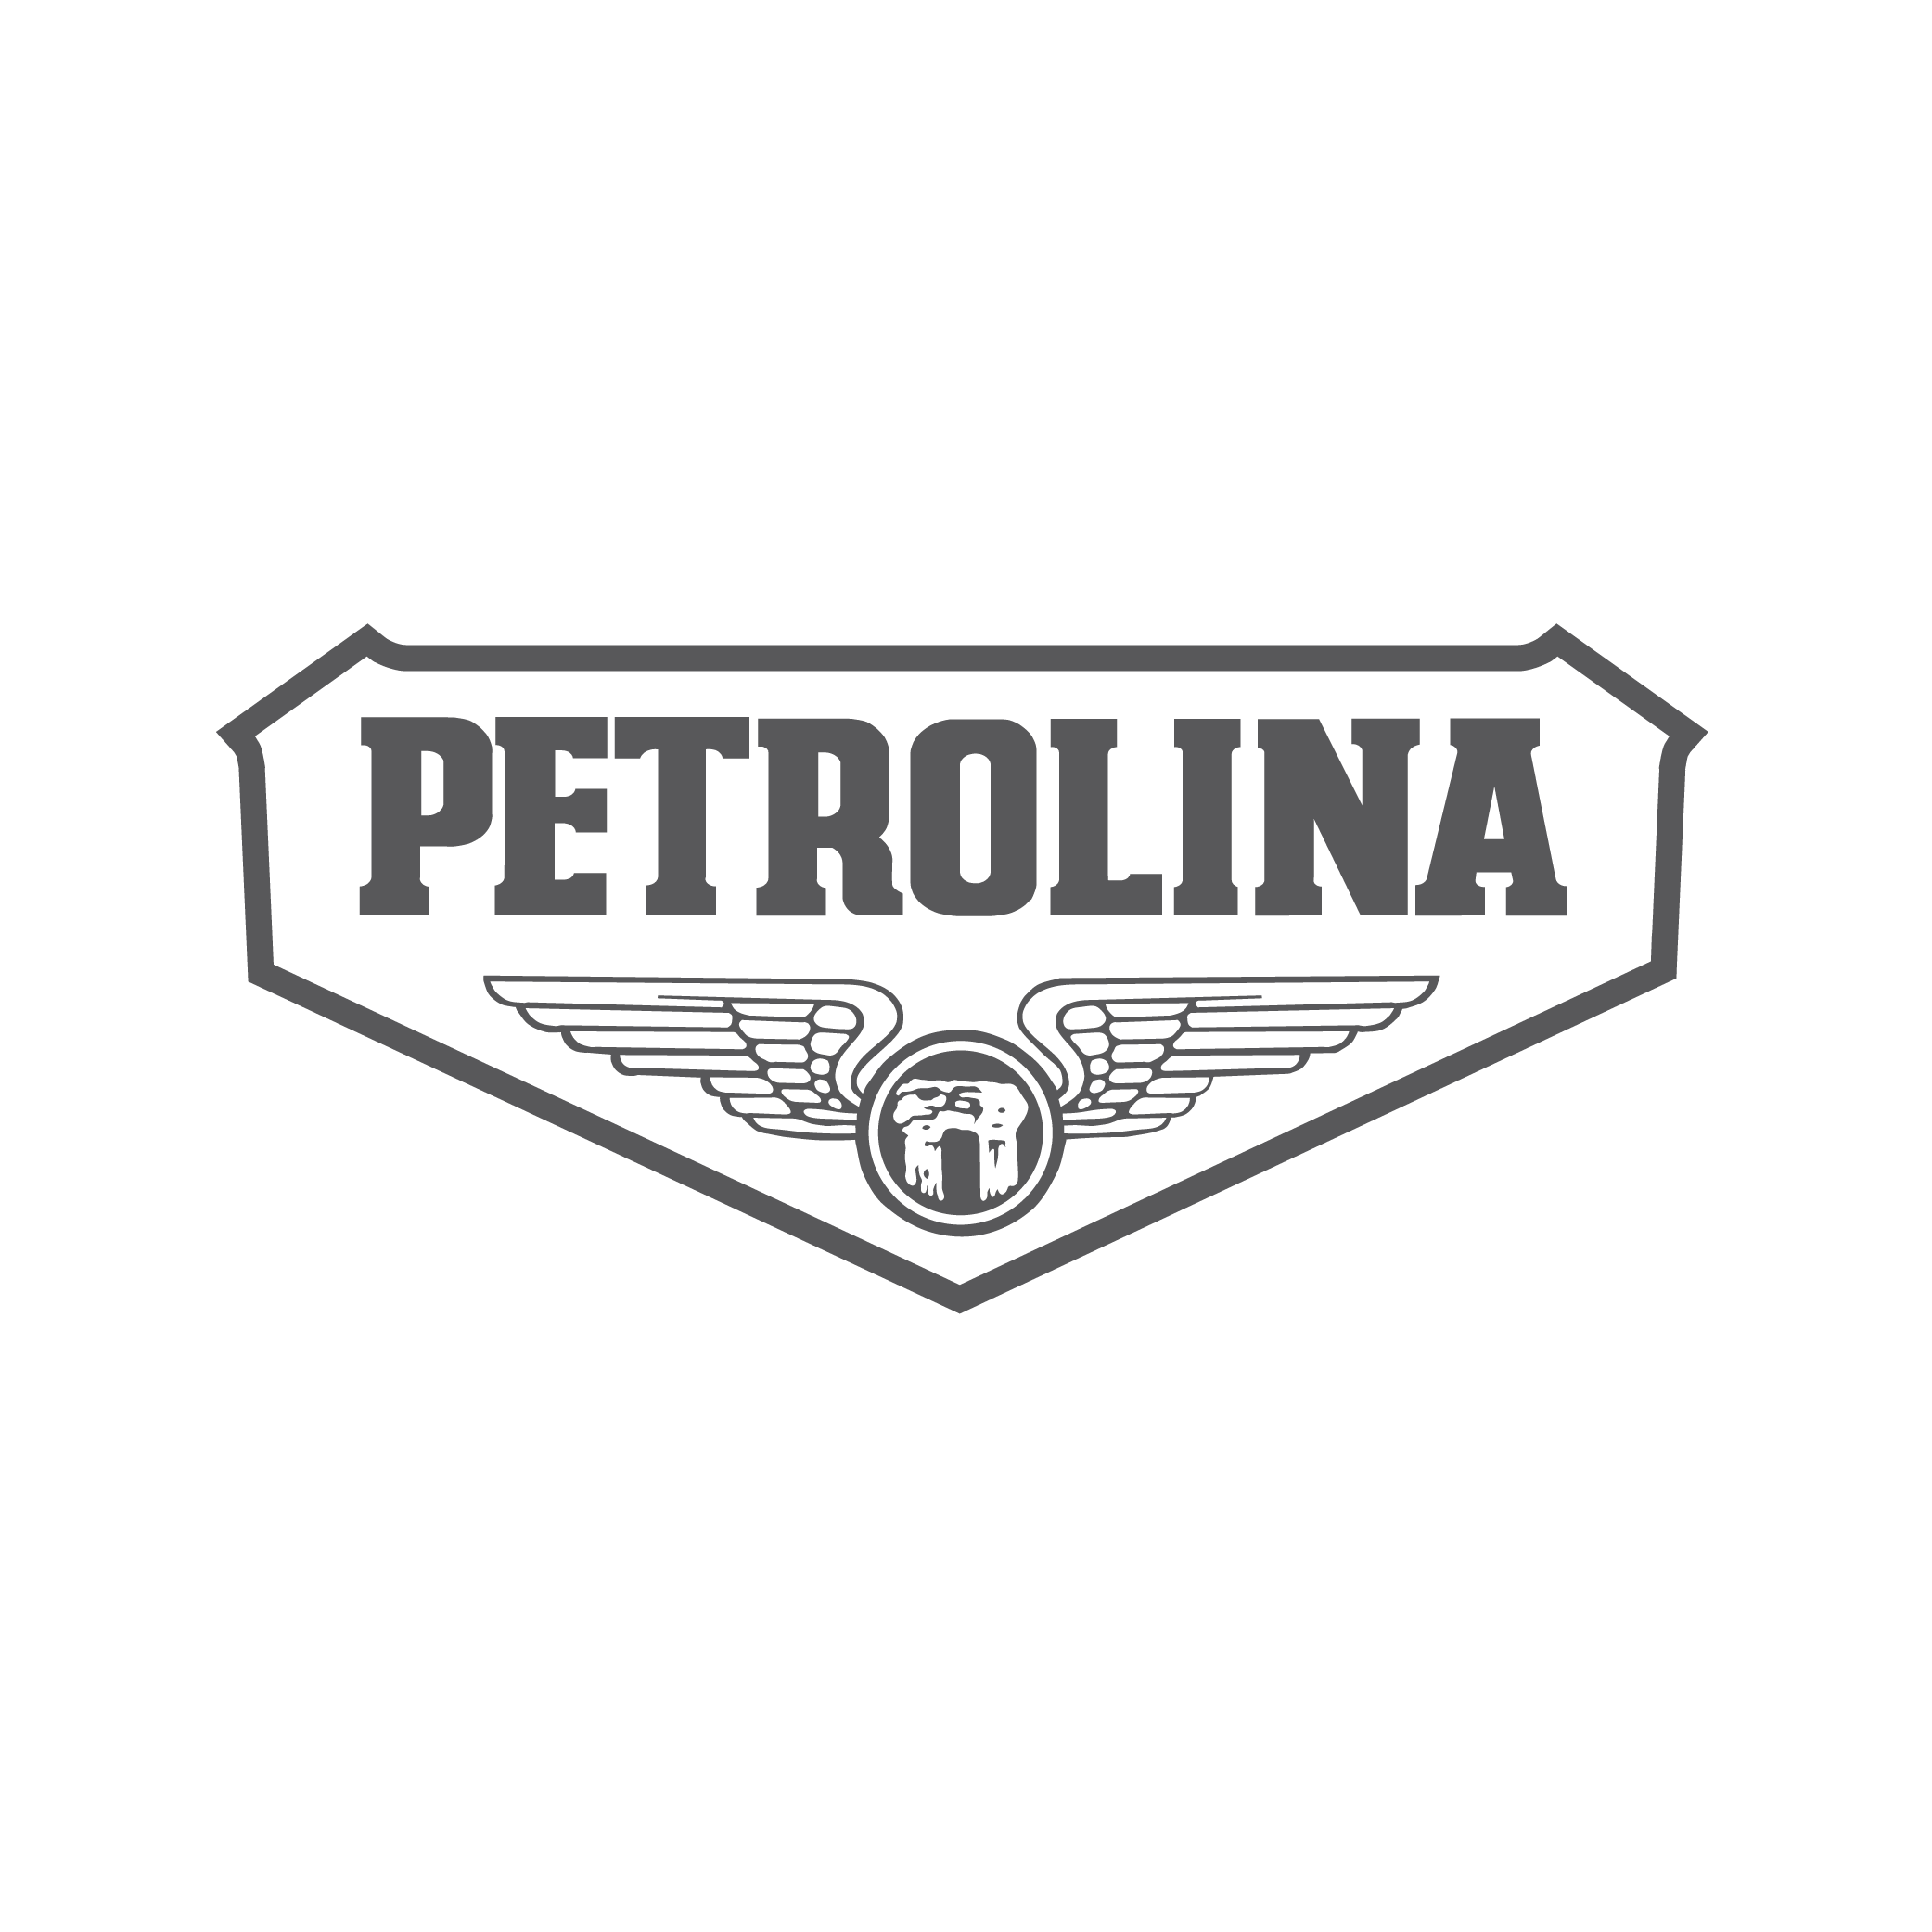 Petrolina logo